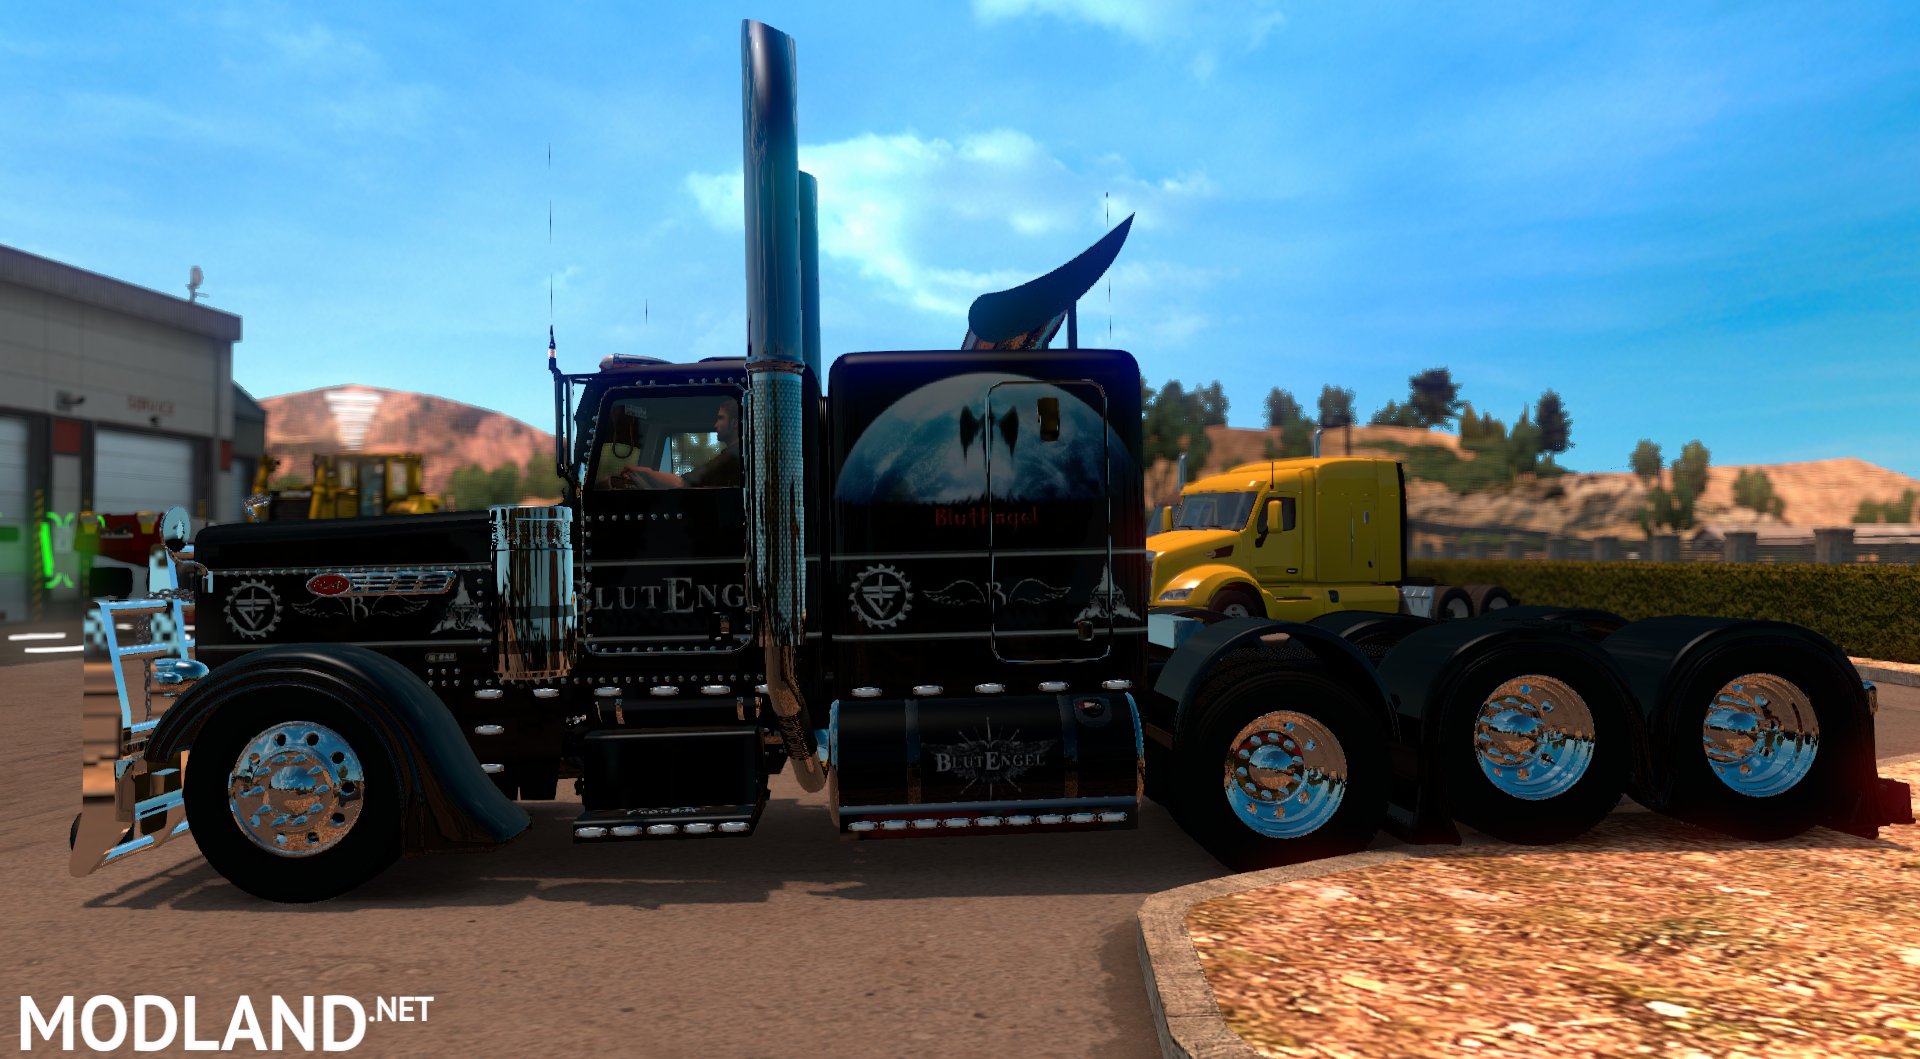 Kenworth Box Truck >> Peterbilt 389 + blutengel skin mod for American Truck Simulator, ATS